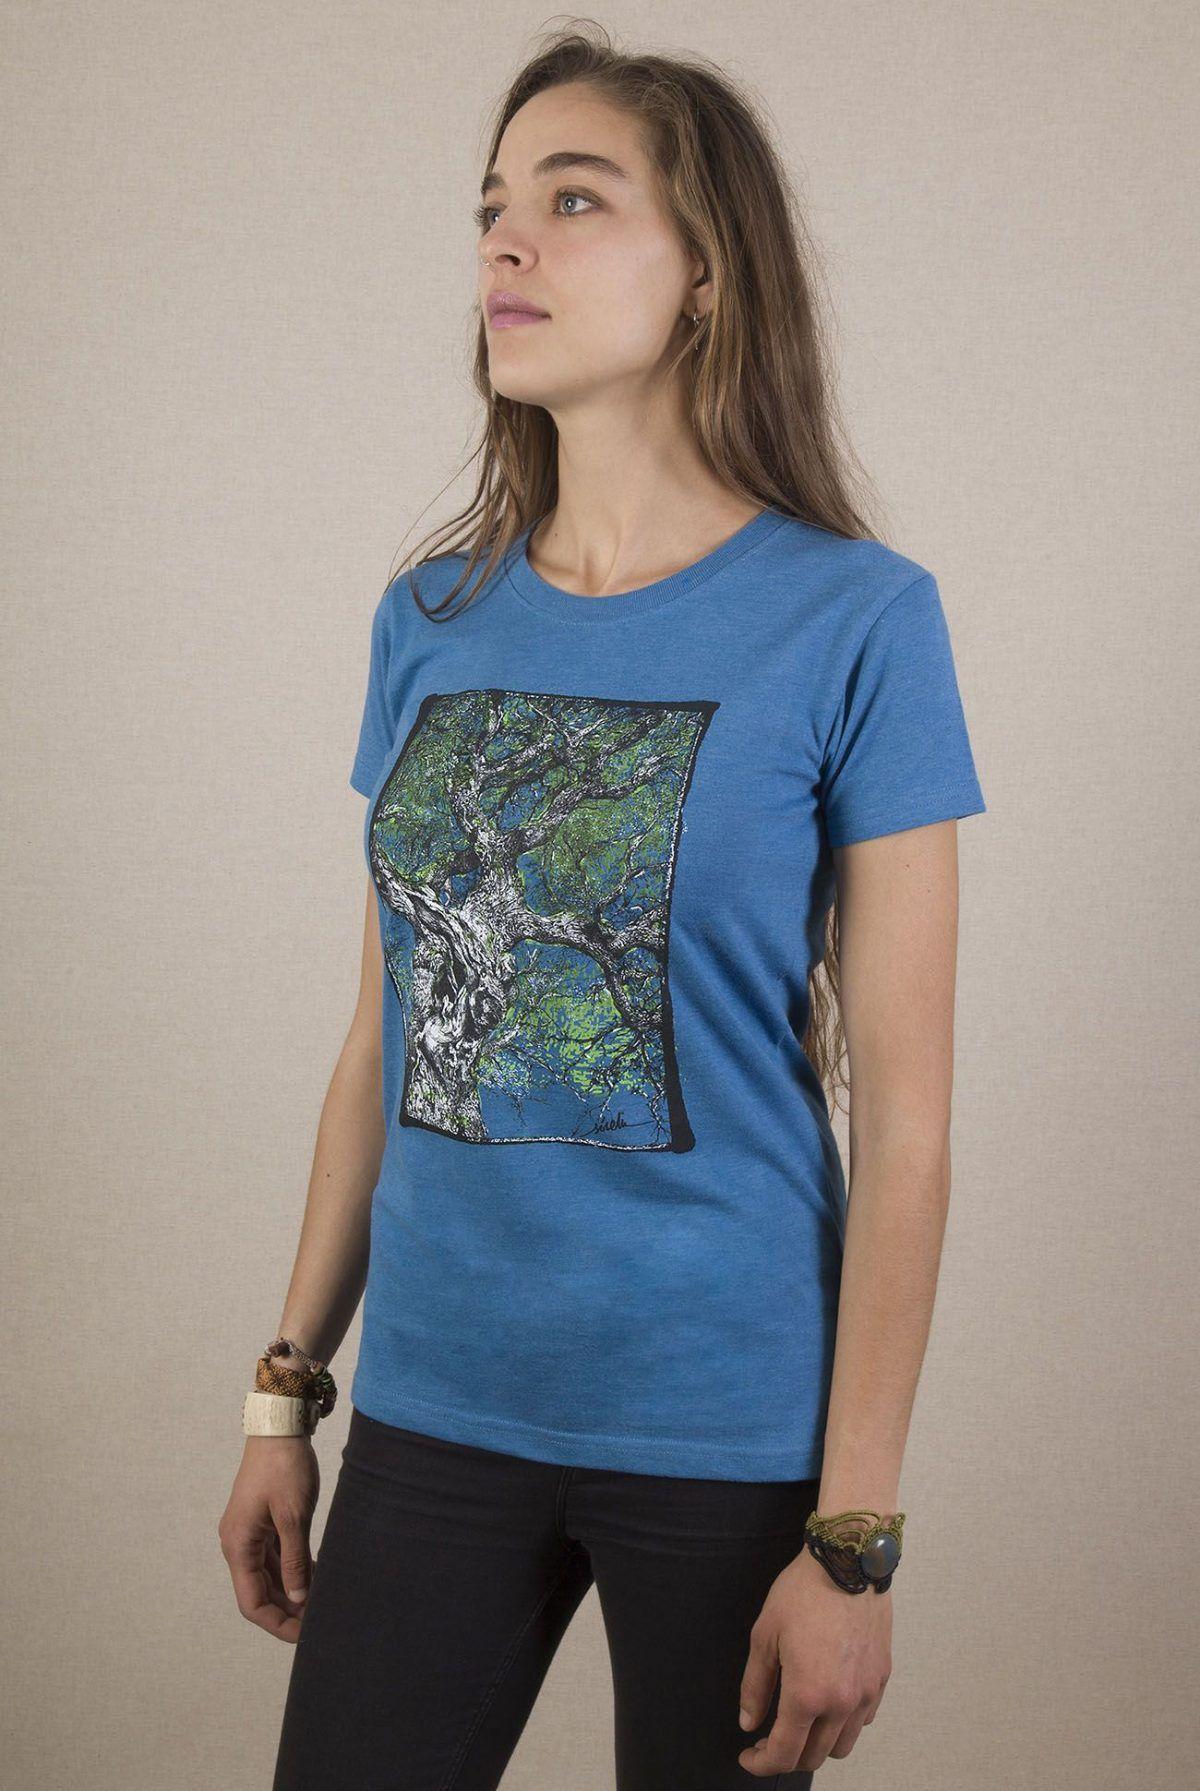 camiseta-ecologica-arbol-singular-azul-sirem-wild